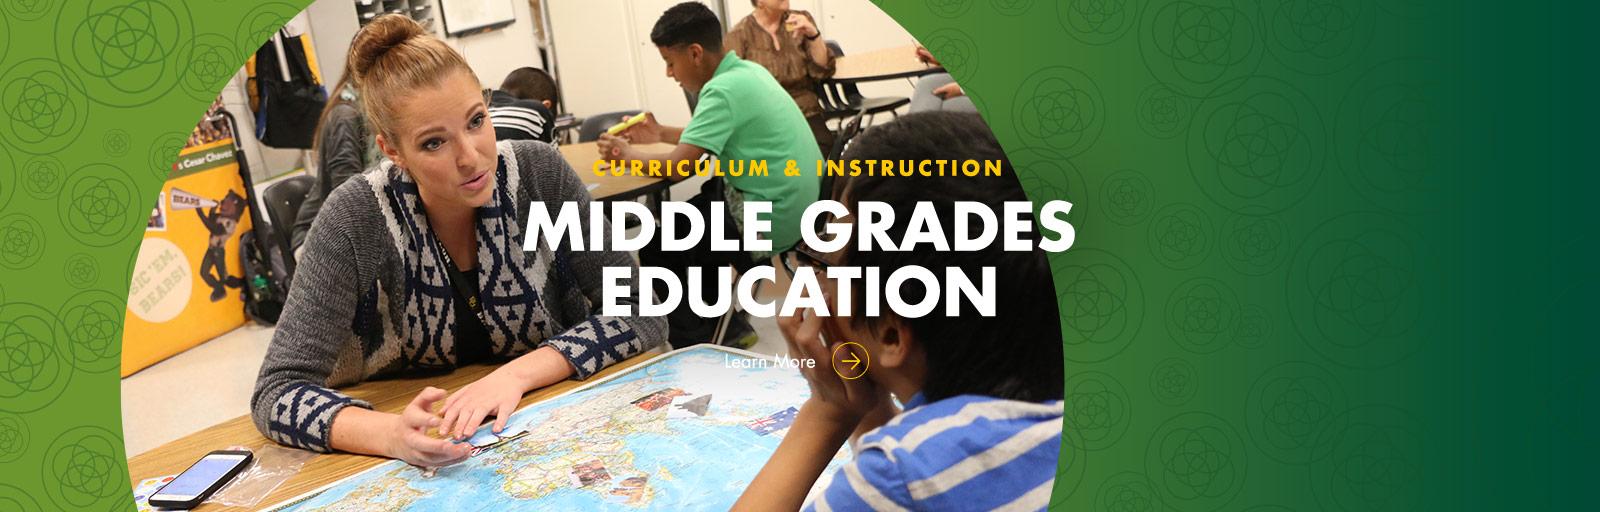 soe-mc_ci-Middle-Grades